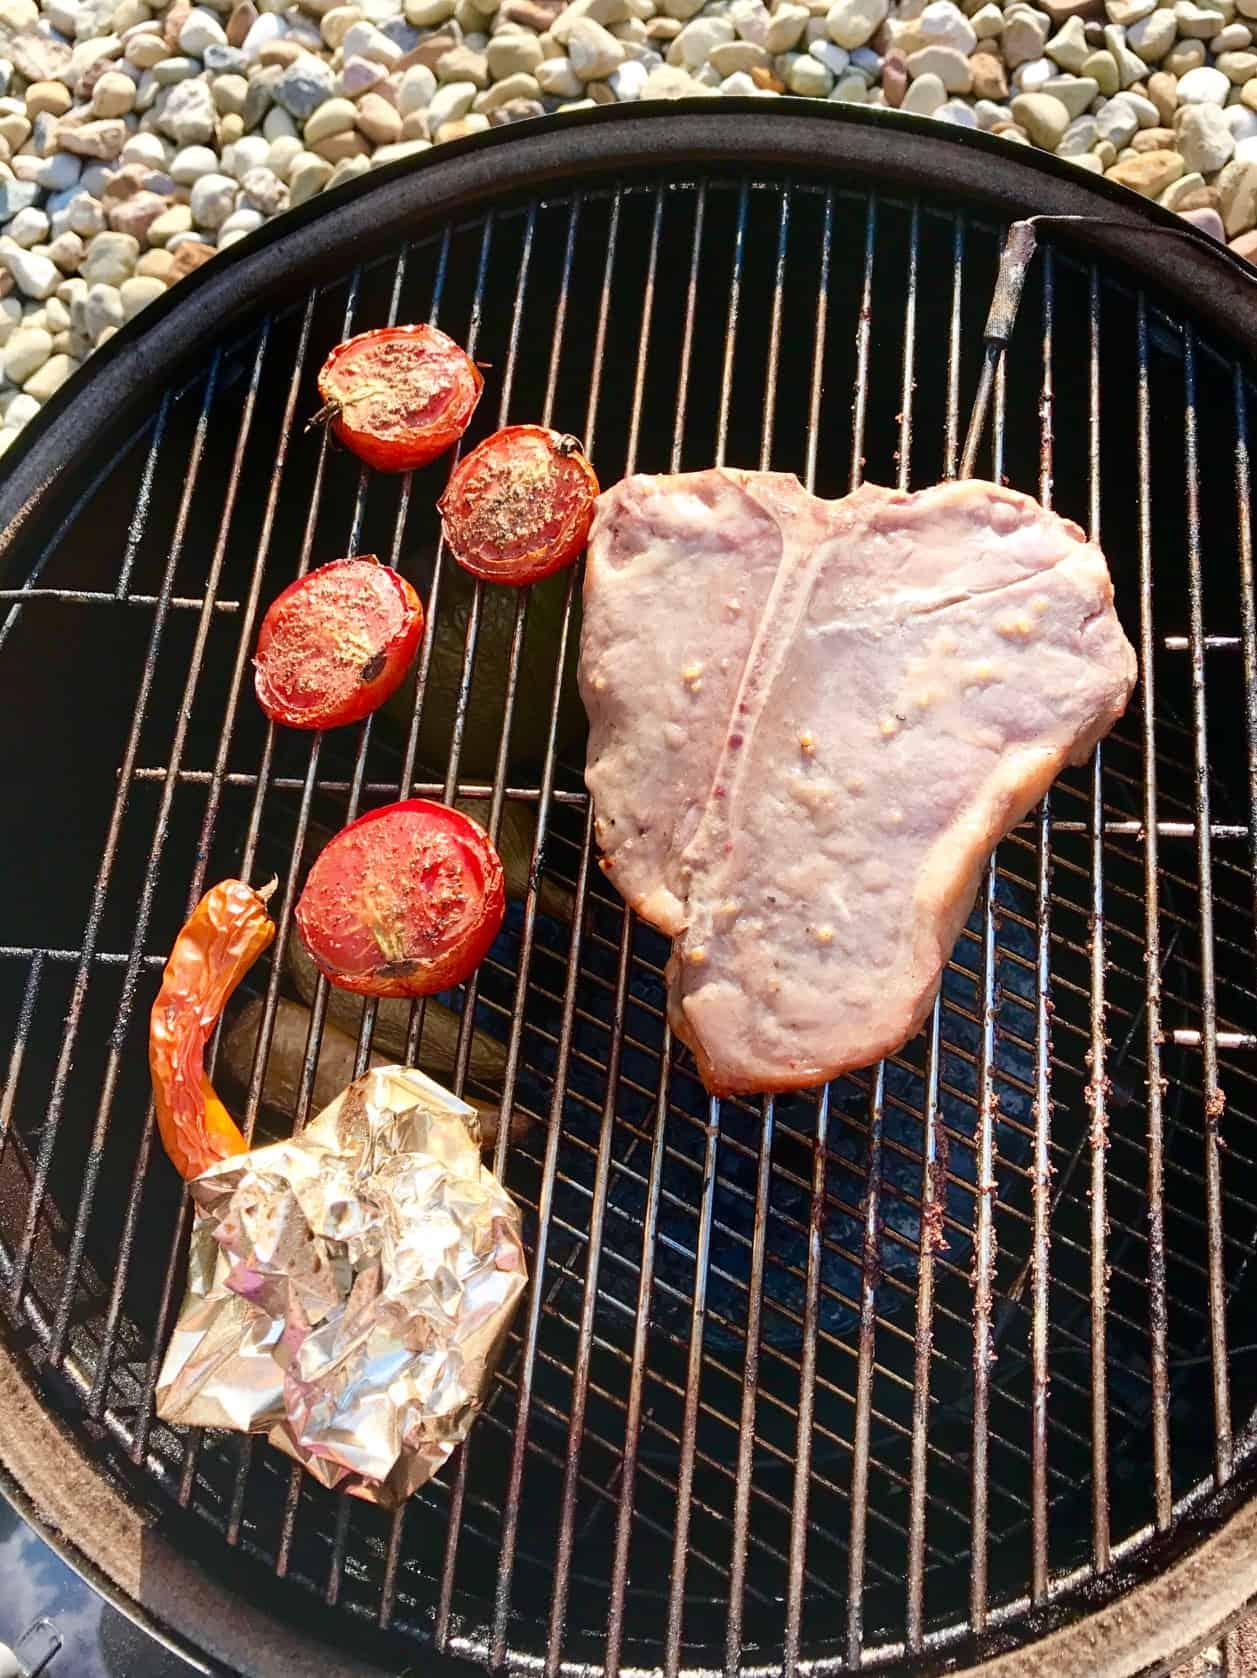 Steak with vegetables on weber grill overhead shot